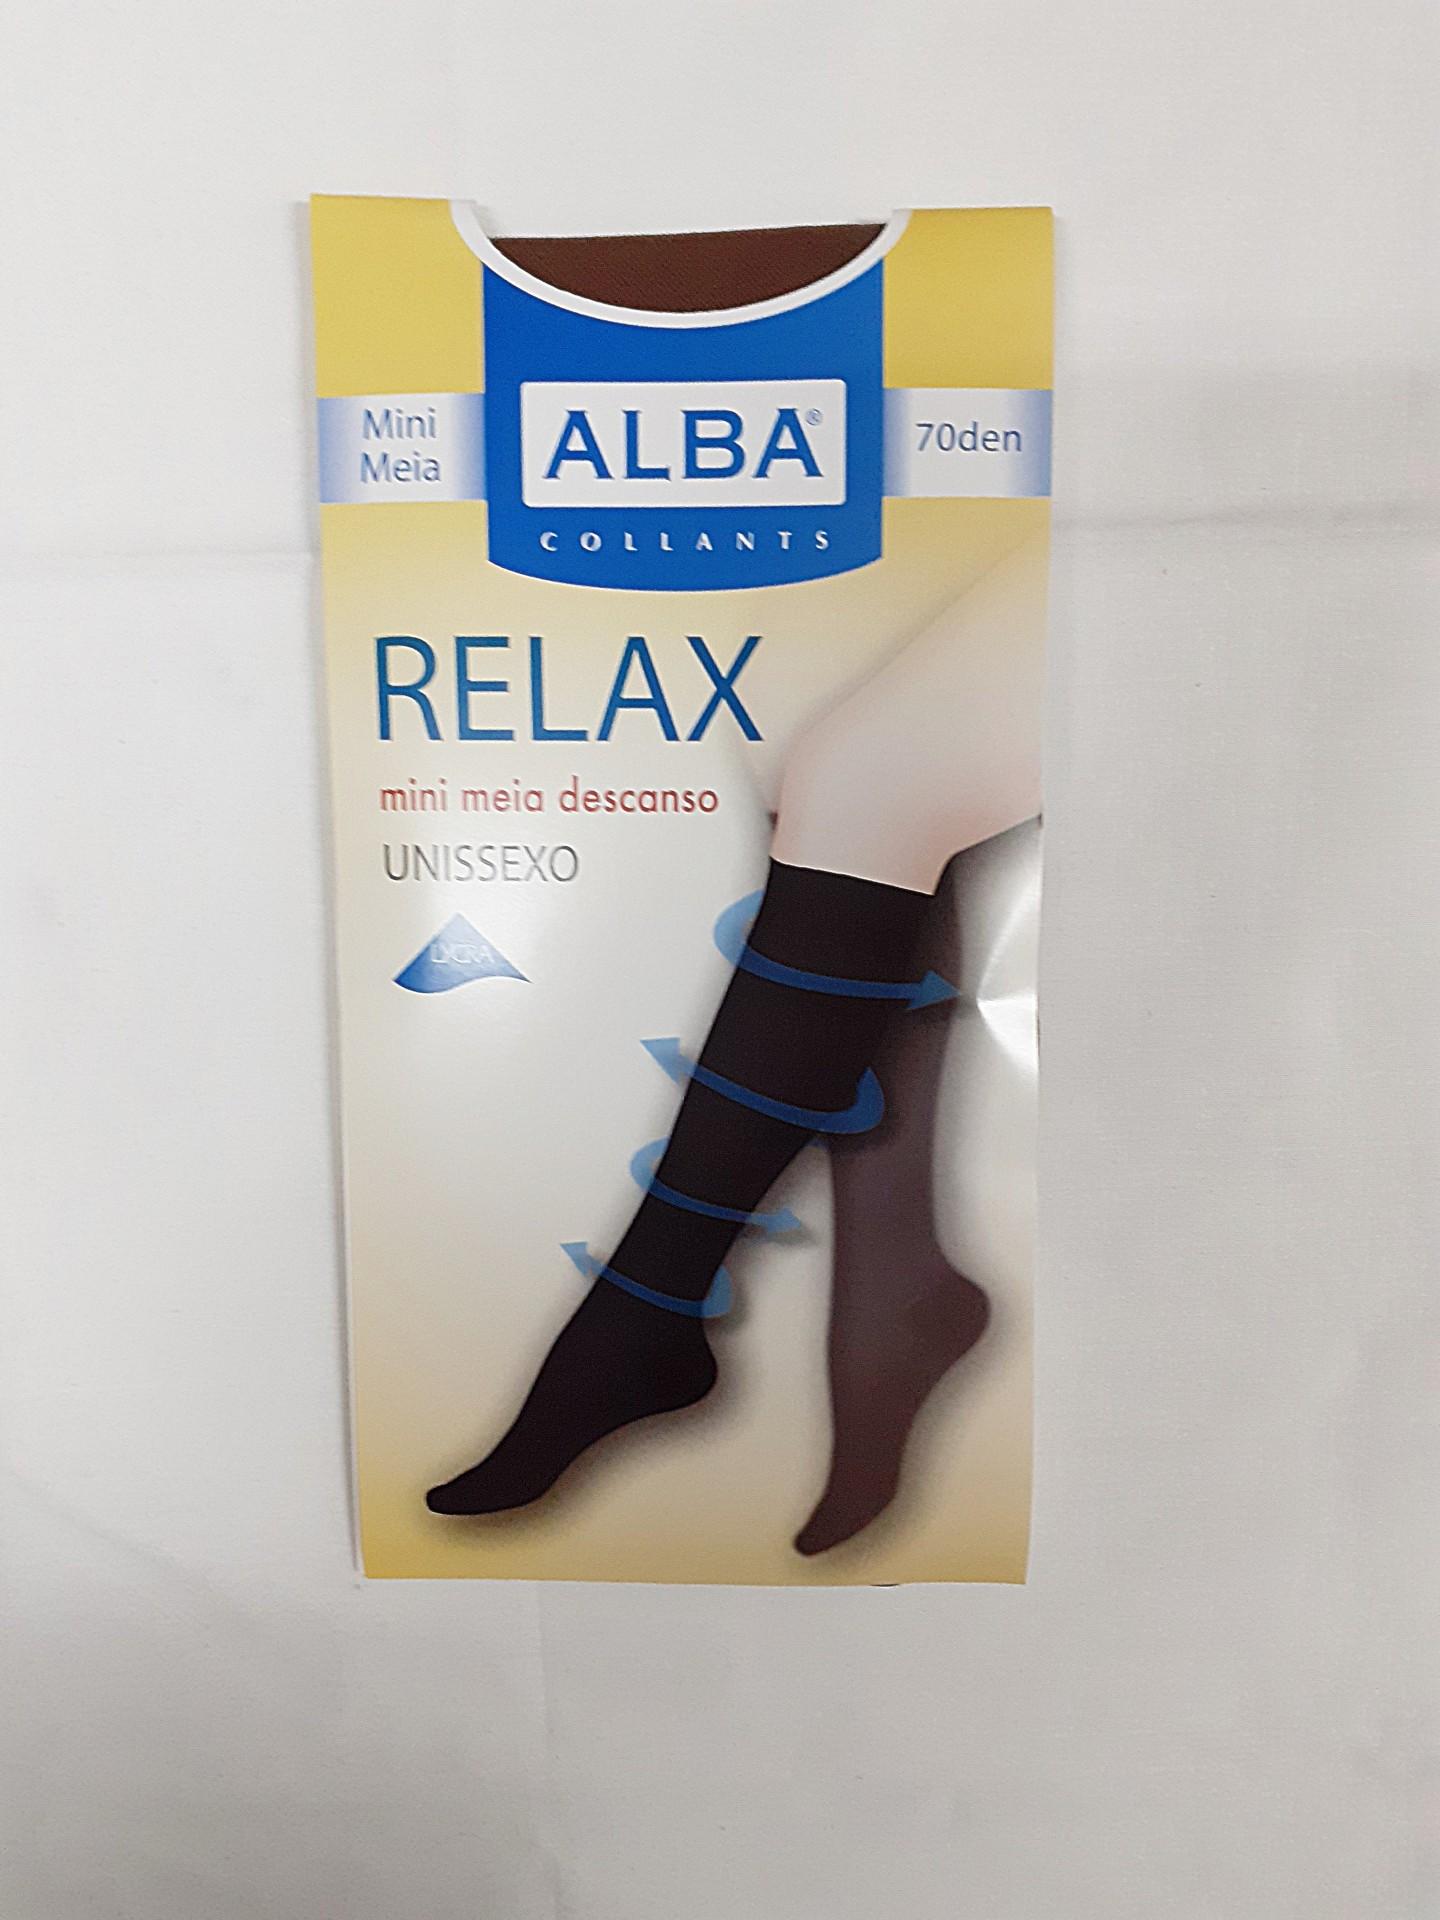 Mini Meia Relax 70 Alba